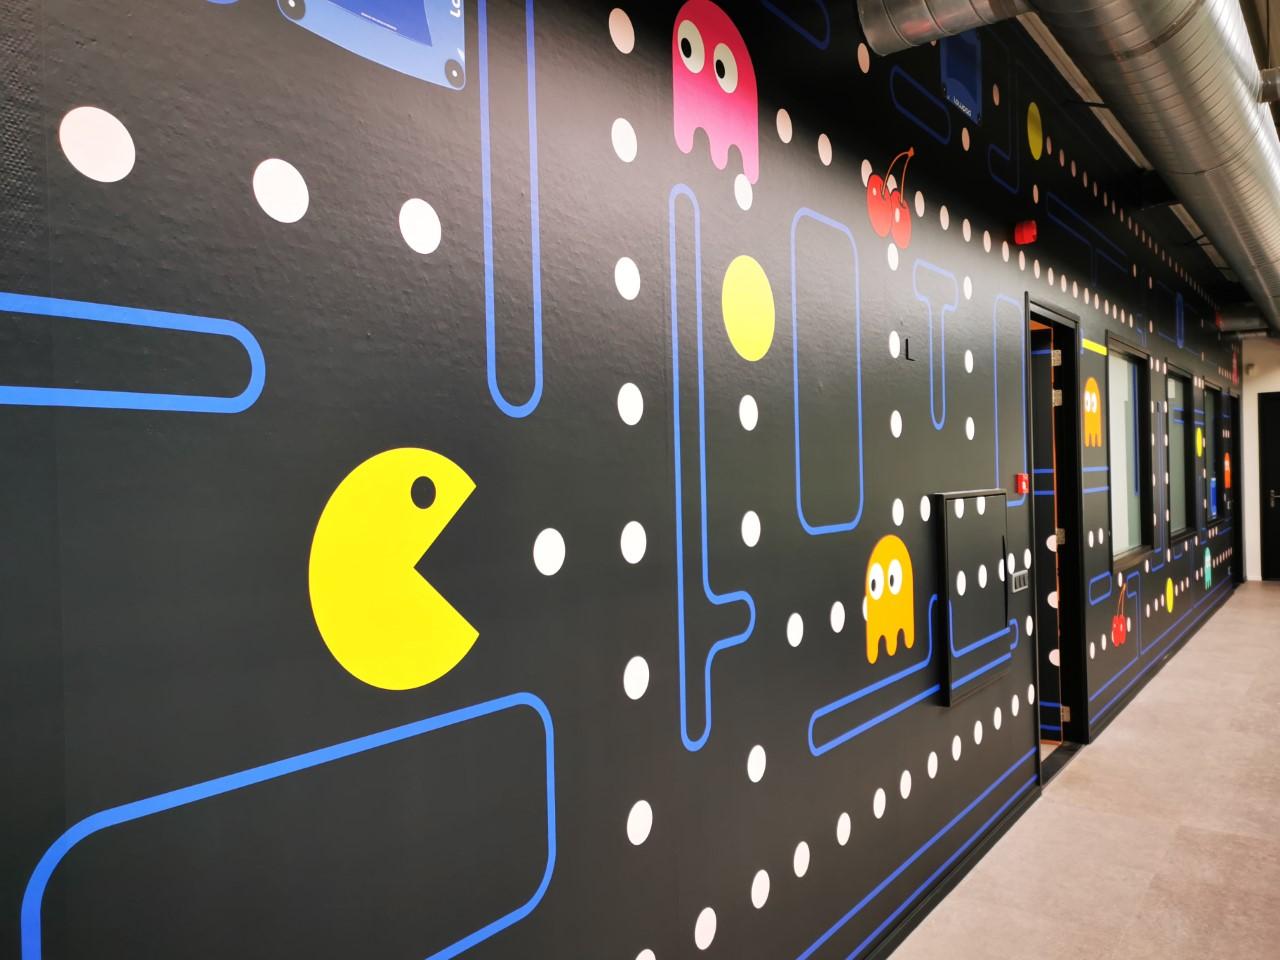 wand visual pacman kantoor idee